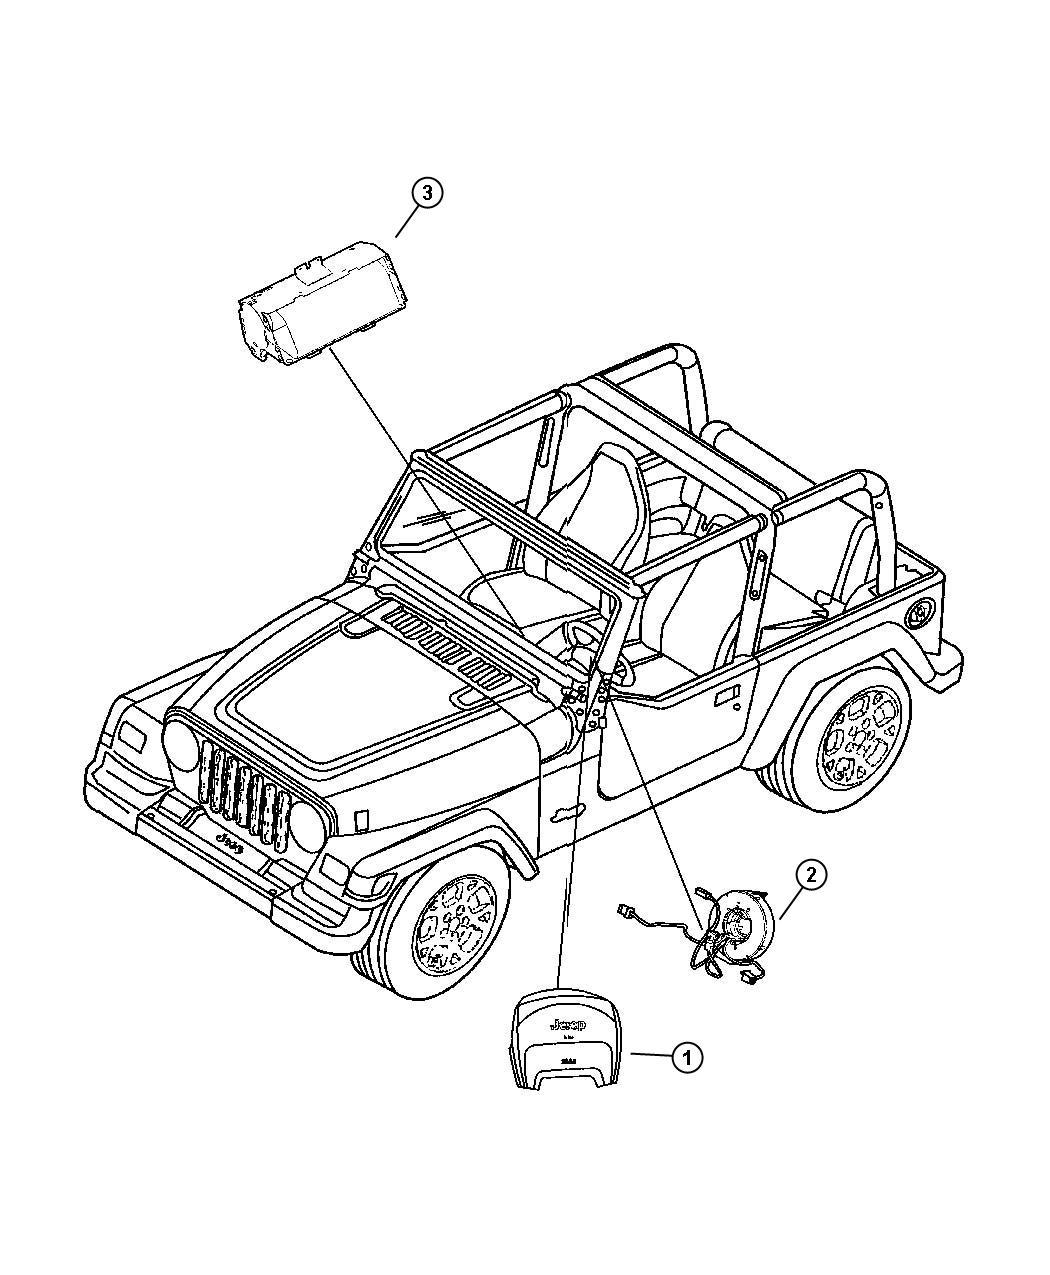 tags: #black jeep wrangler custom wheels#black 2010 jeep wrangler 4 door  lifted#2010 jeep wrangler unlimited#jeep wrangler with 35 inch tires#2010  jeep